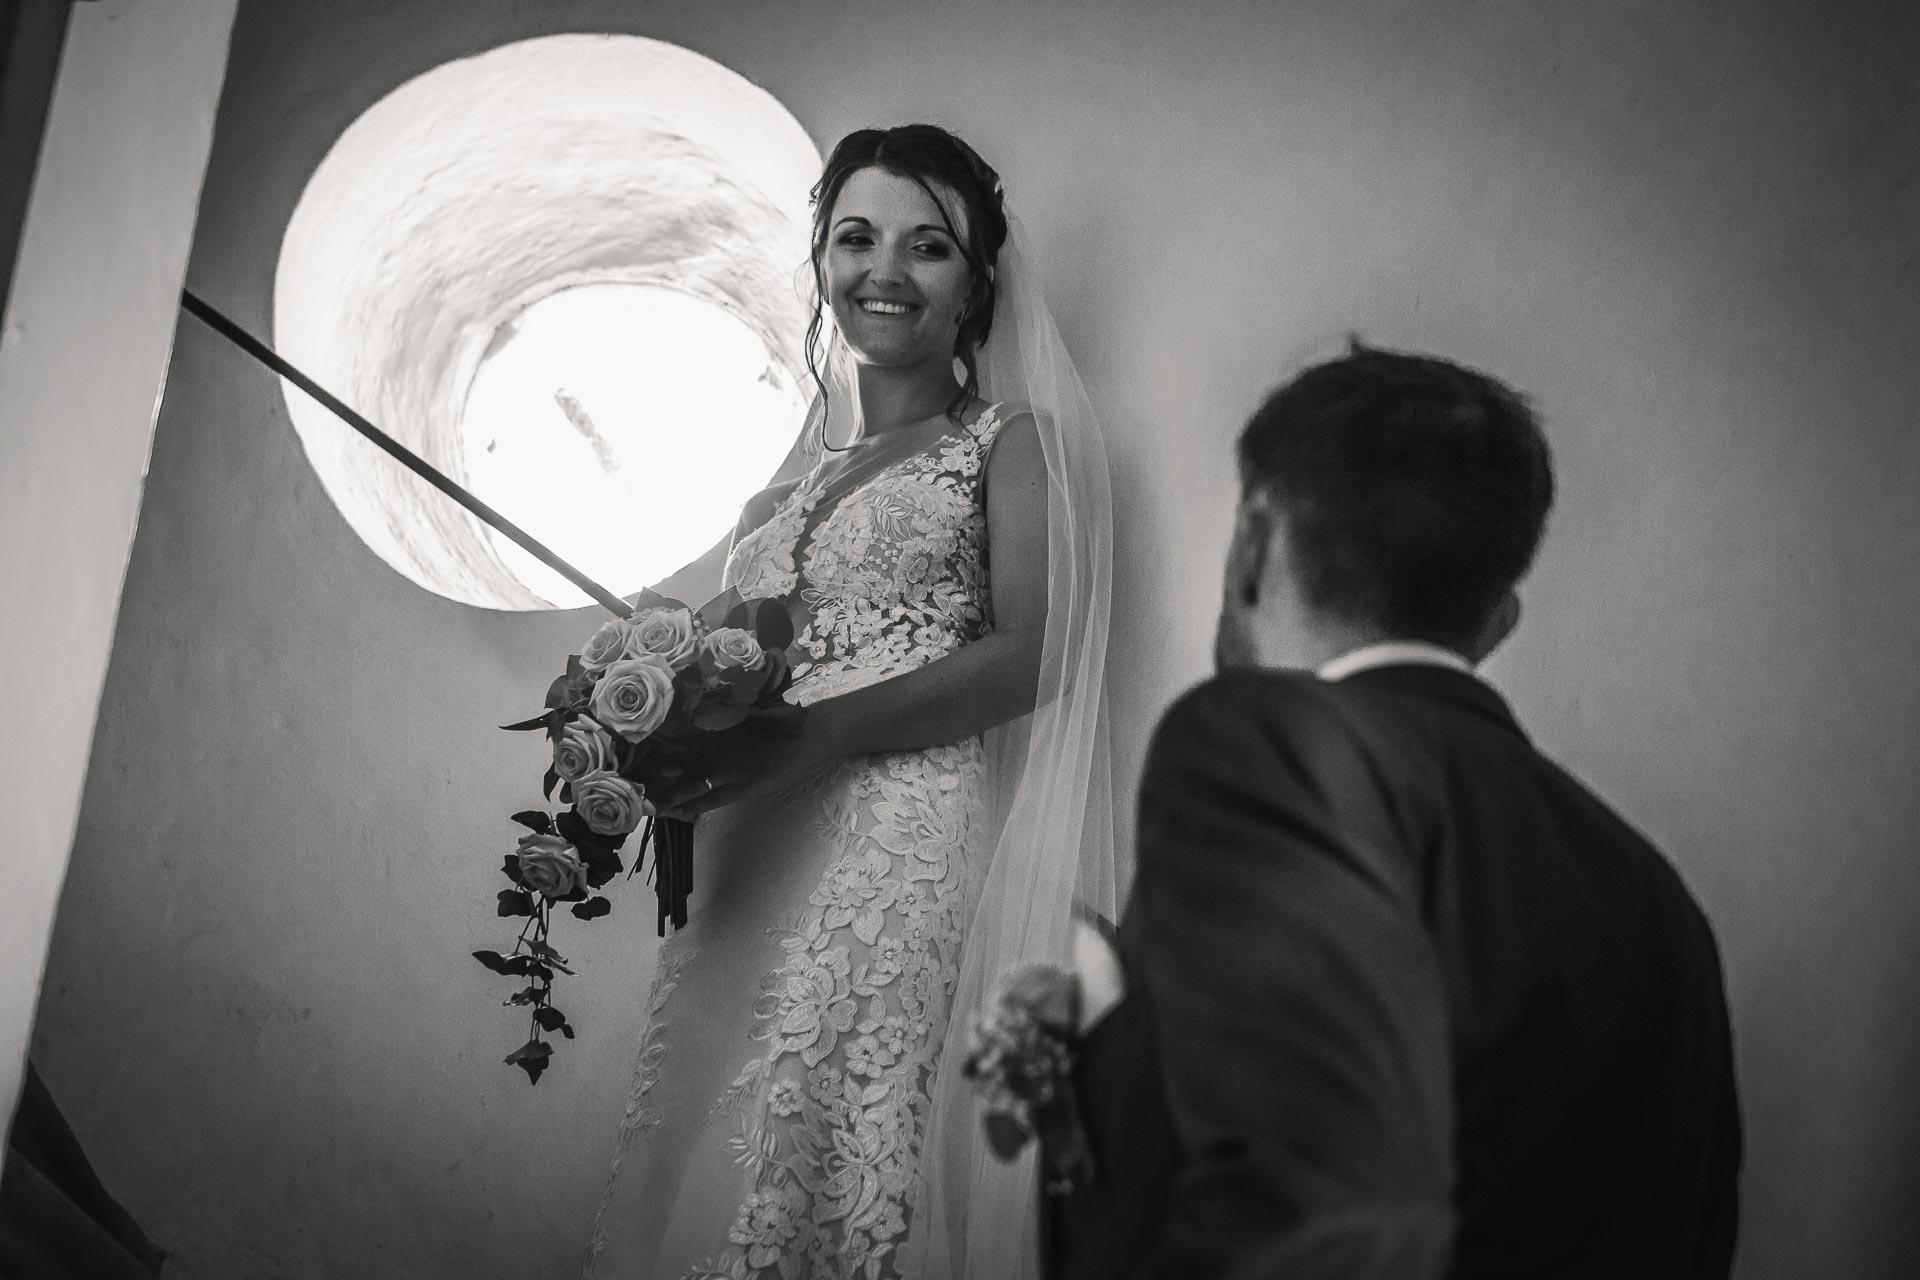 svatební-fotograf-wedding-svatebni-video-orlík-vltava-kostel-statek-stodola-boho-svatba-Beautyfoto-298